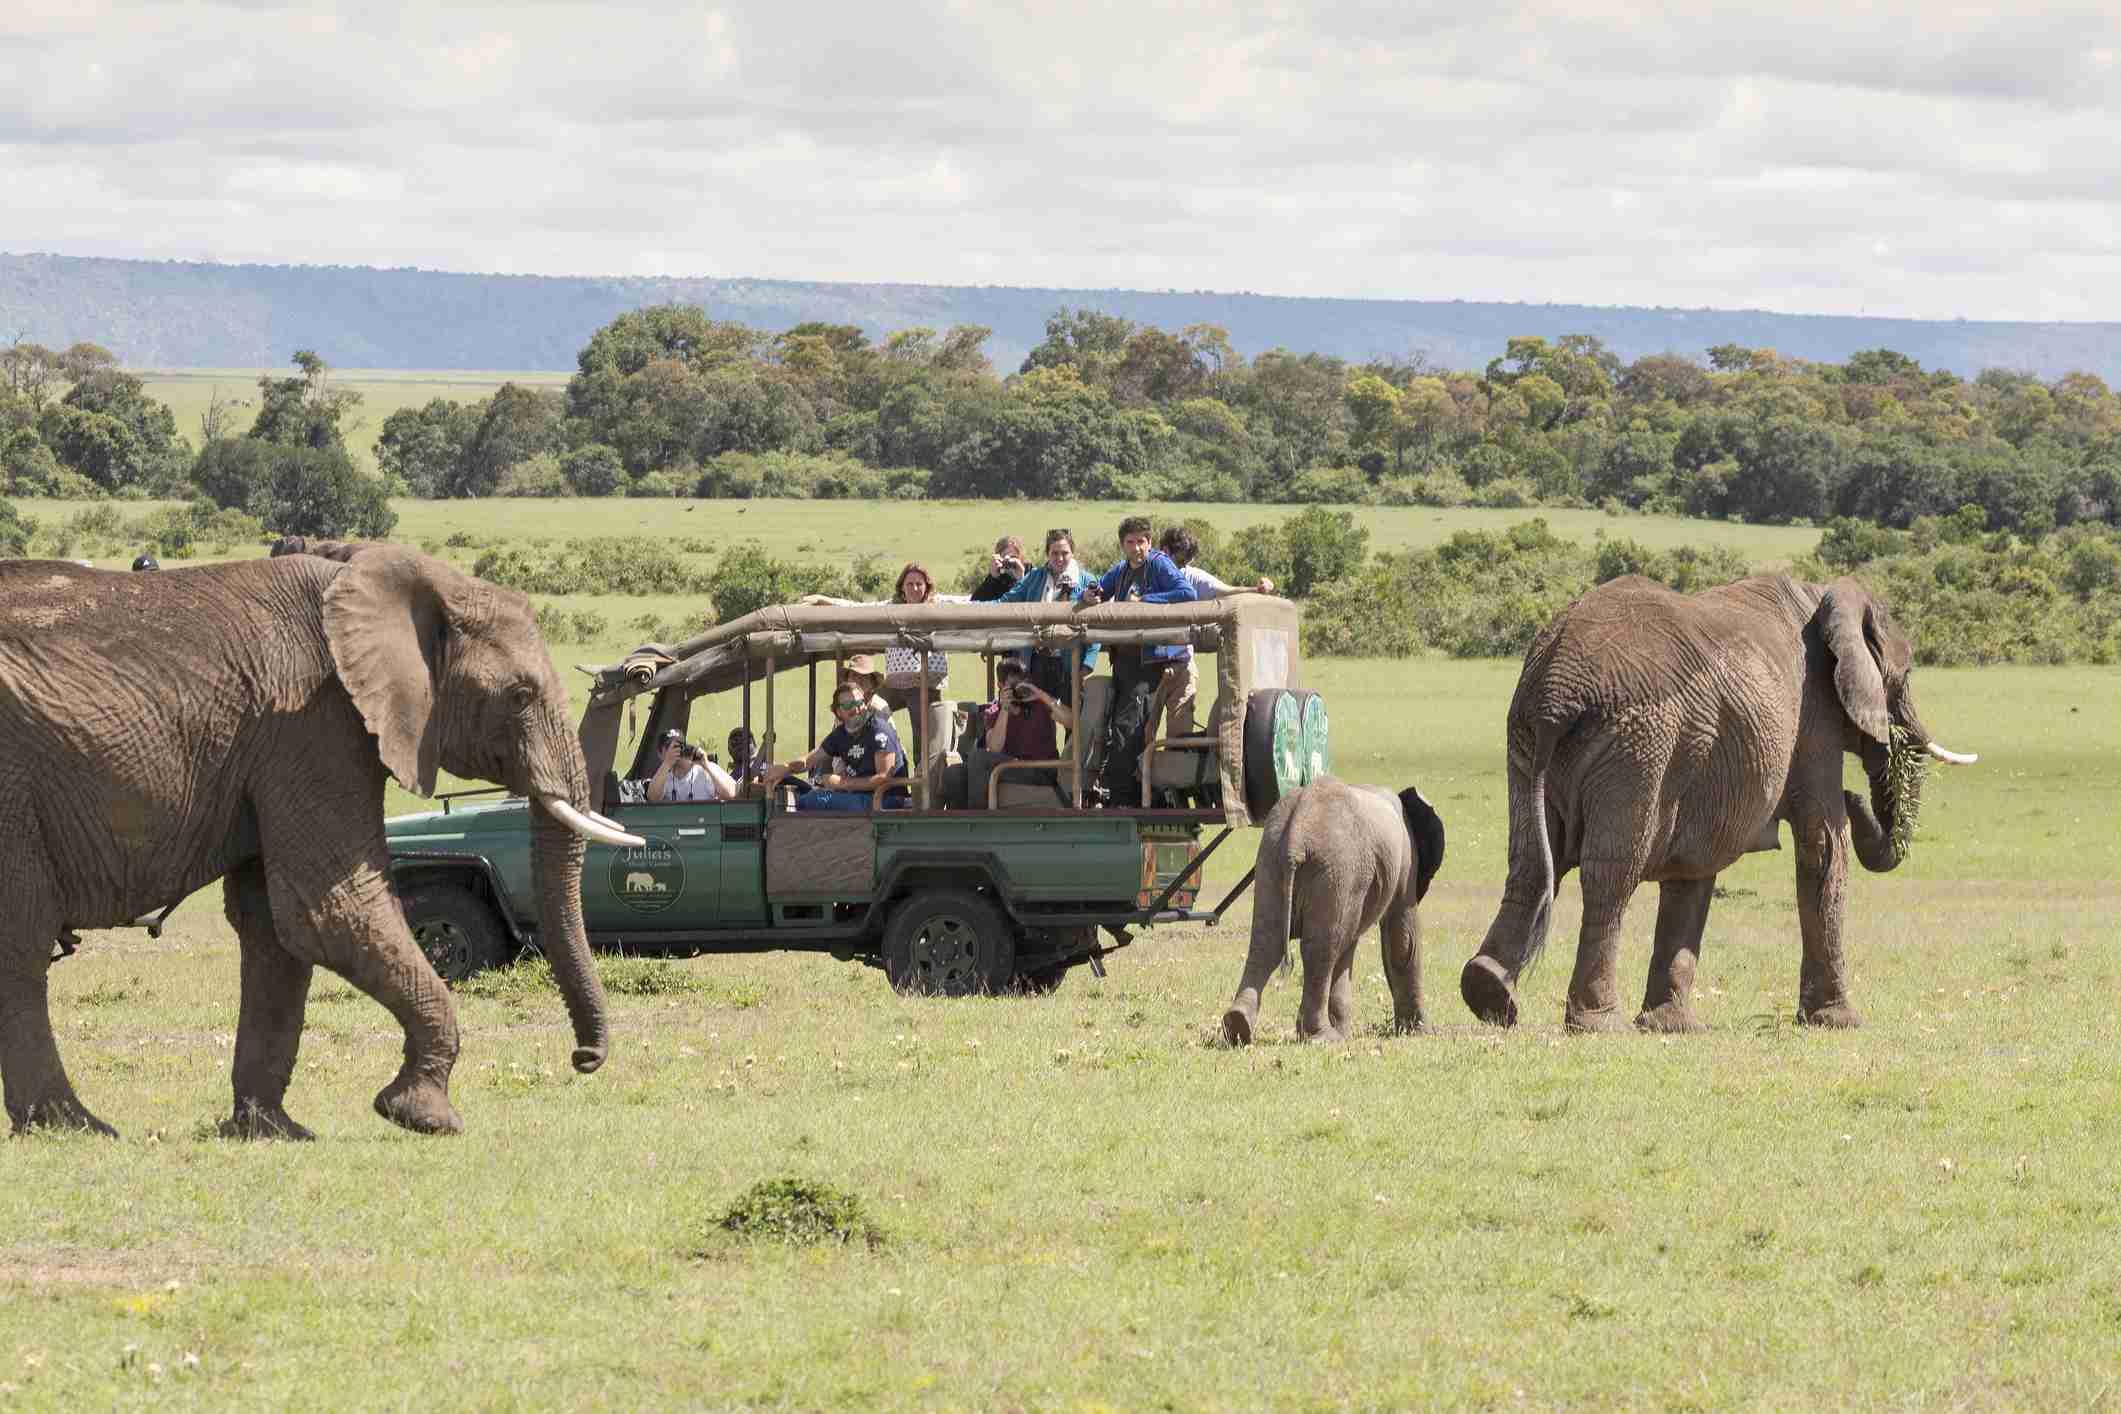 Elephants with young calf and safari tourists in Masai Mara national park